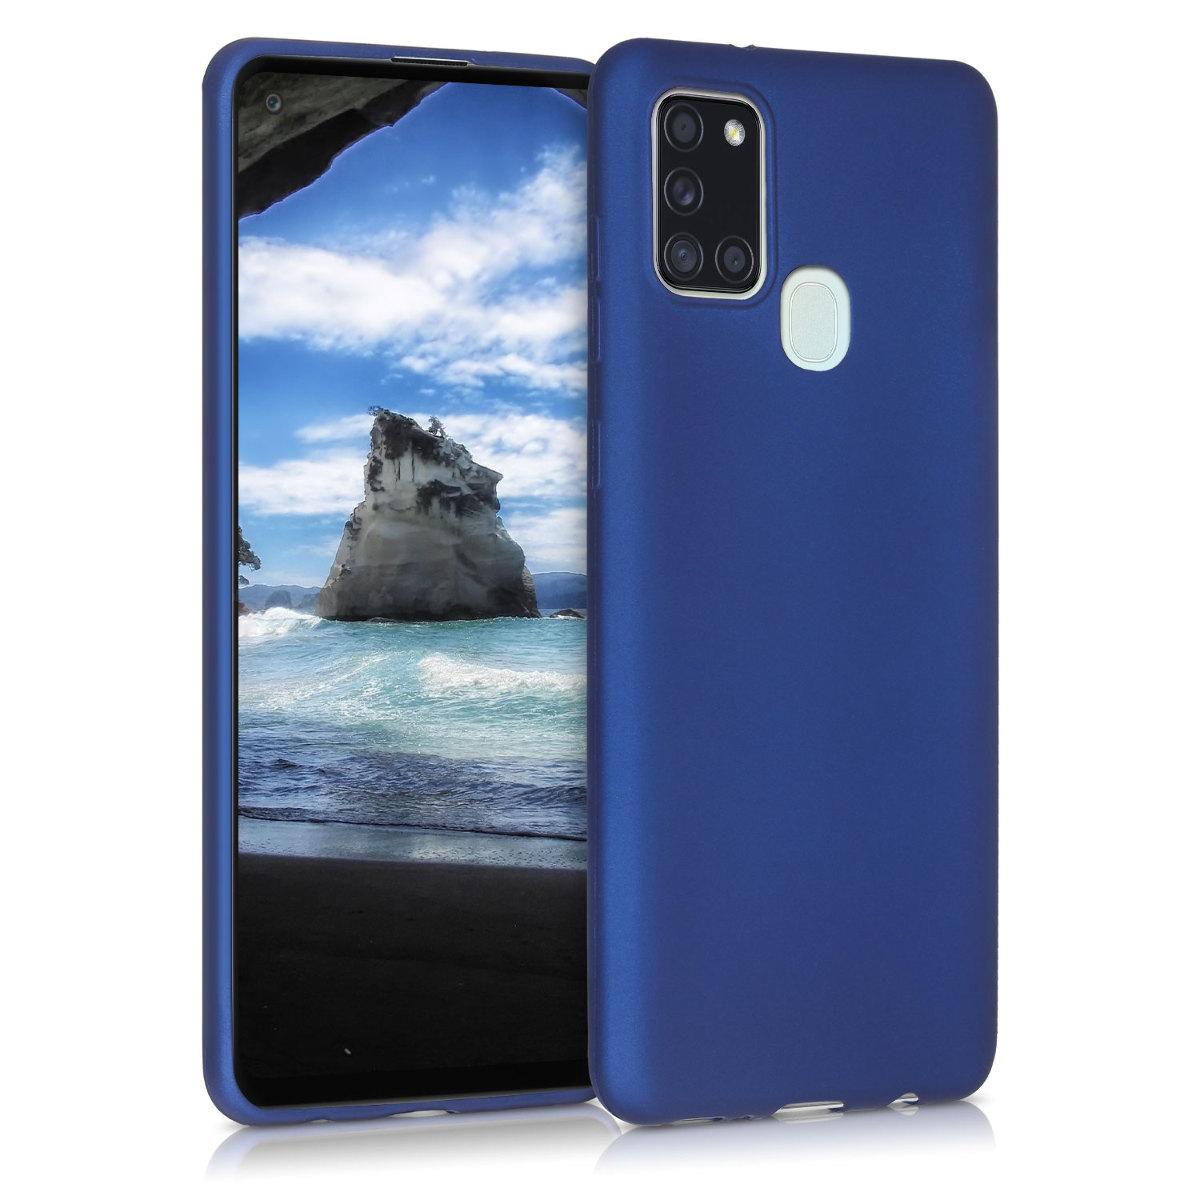 KW Θήκη Σιλικόνης Samsung Galaxy A21s - Metallic Blue (52495.64)